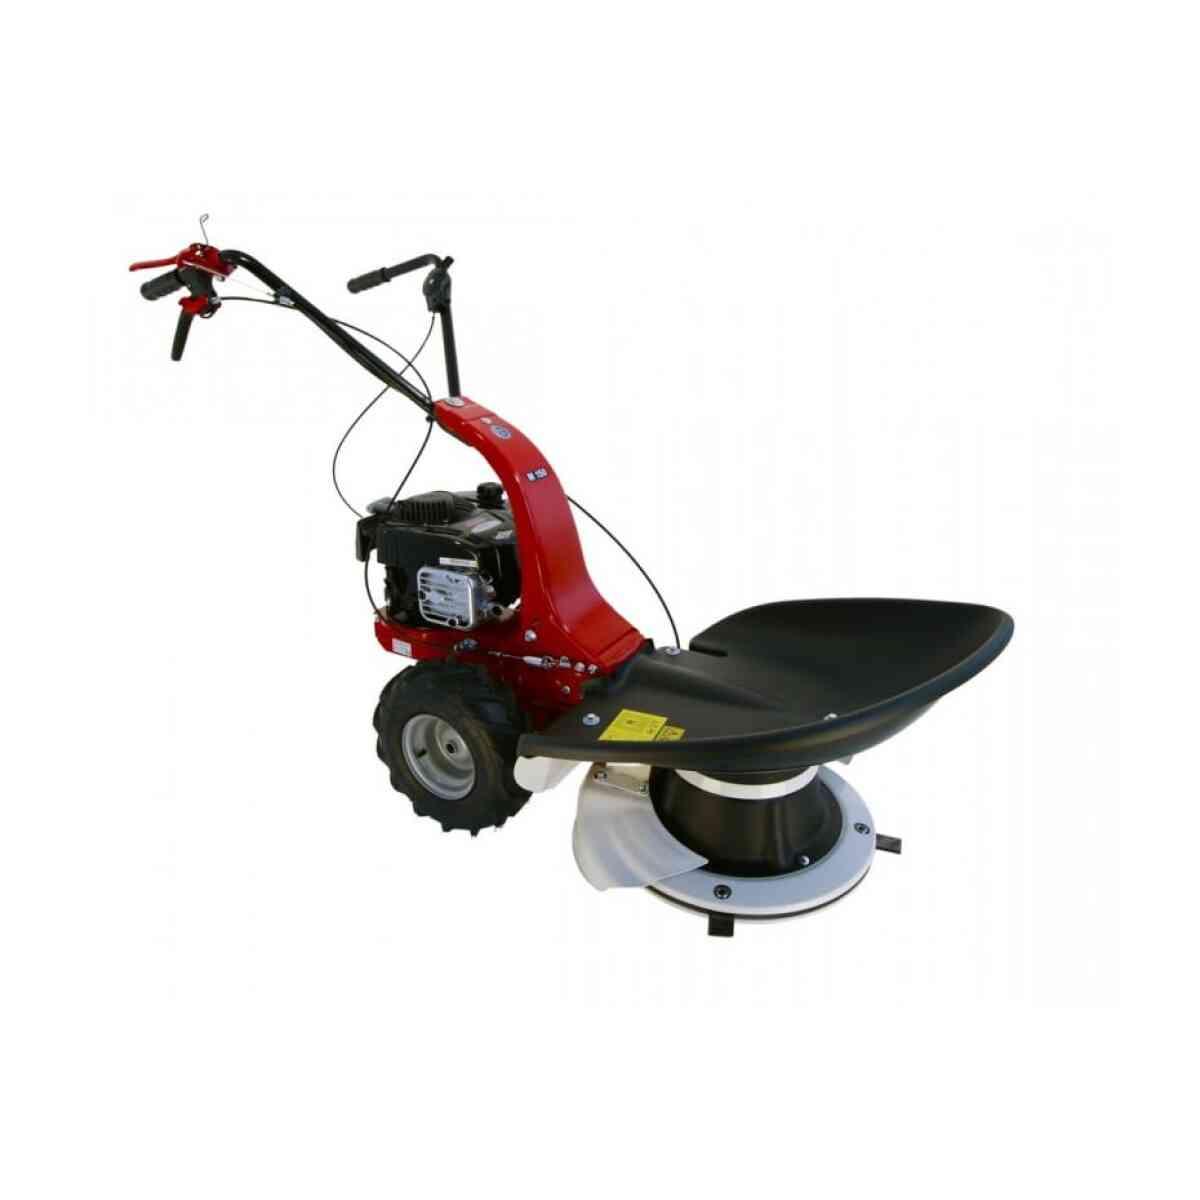 motocositoare rotativa o mac m150 bs 625 exi series 57cm padure gardina.ro 83